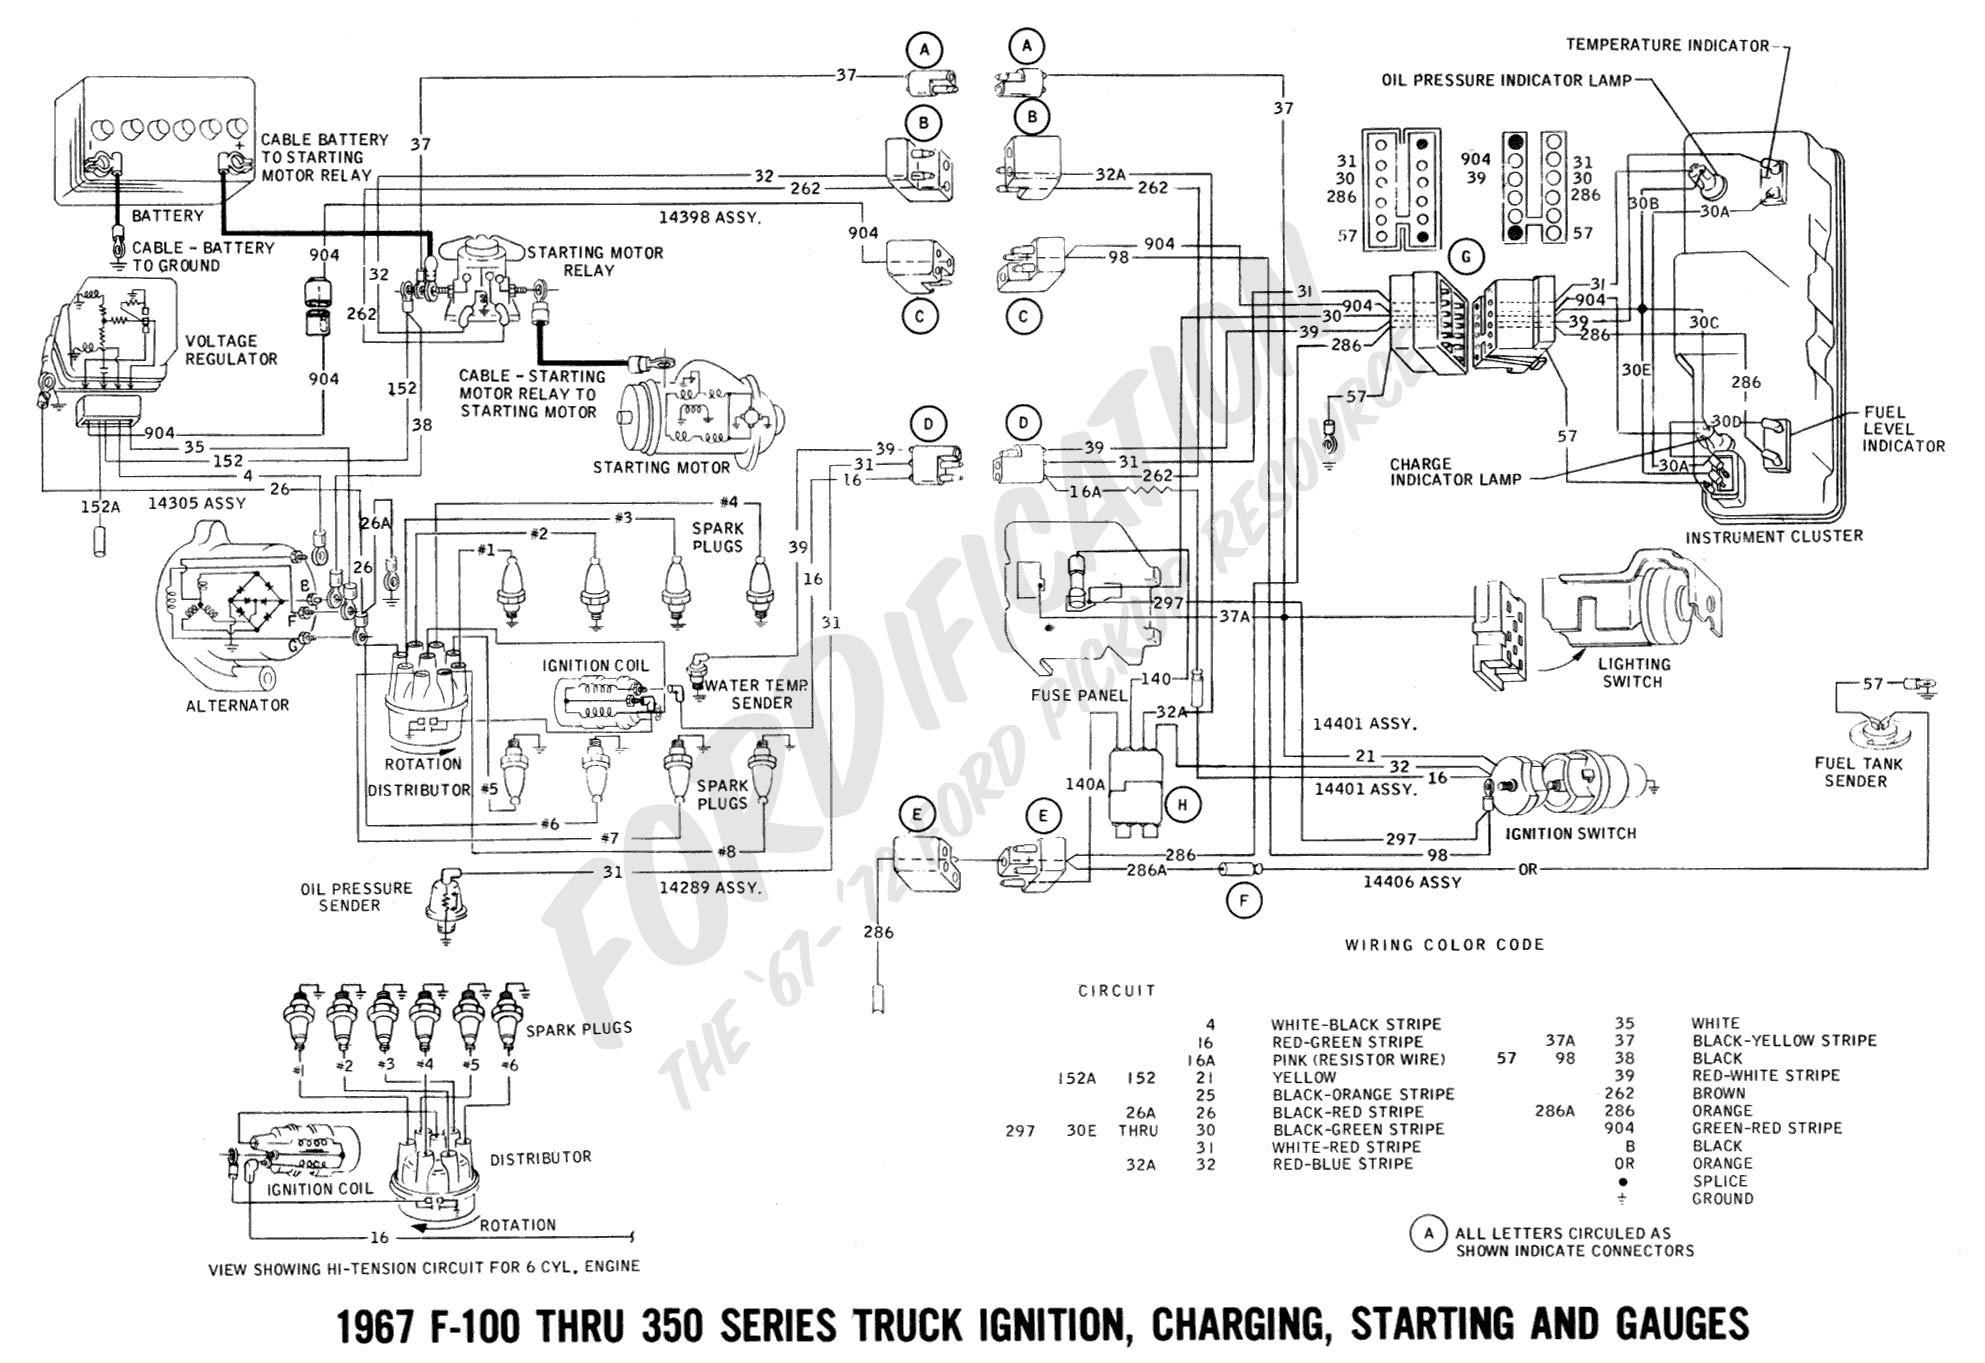 Ford Ignition Wiring Diagram Engine Start button Wiring Diagram ford Ignition Switch Wiring Of Ford Ignition Wiring Diagram